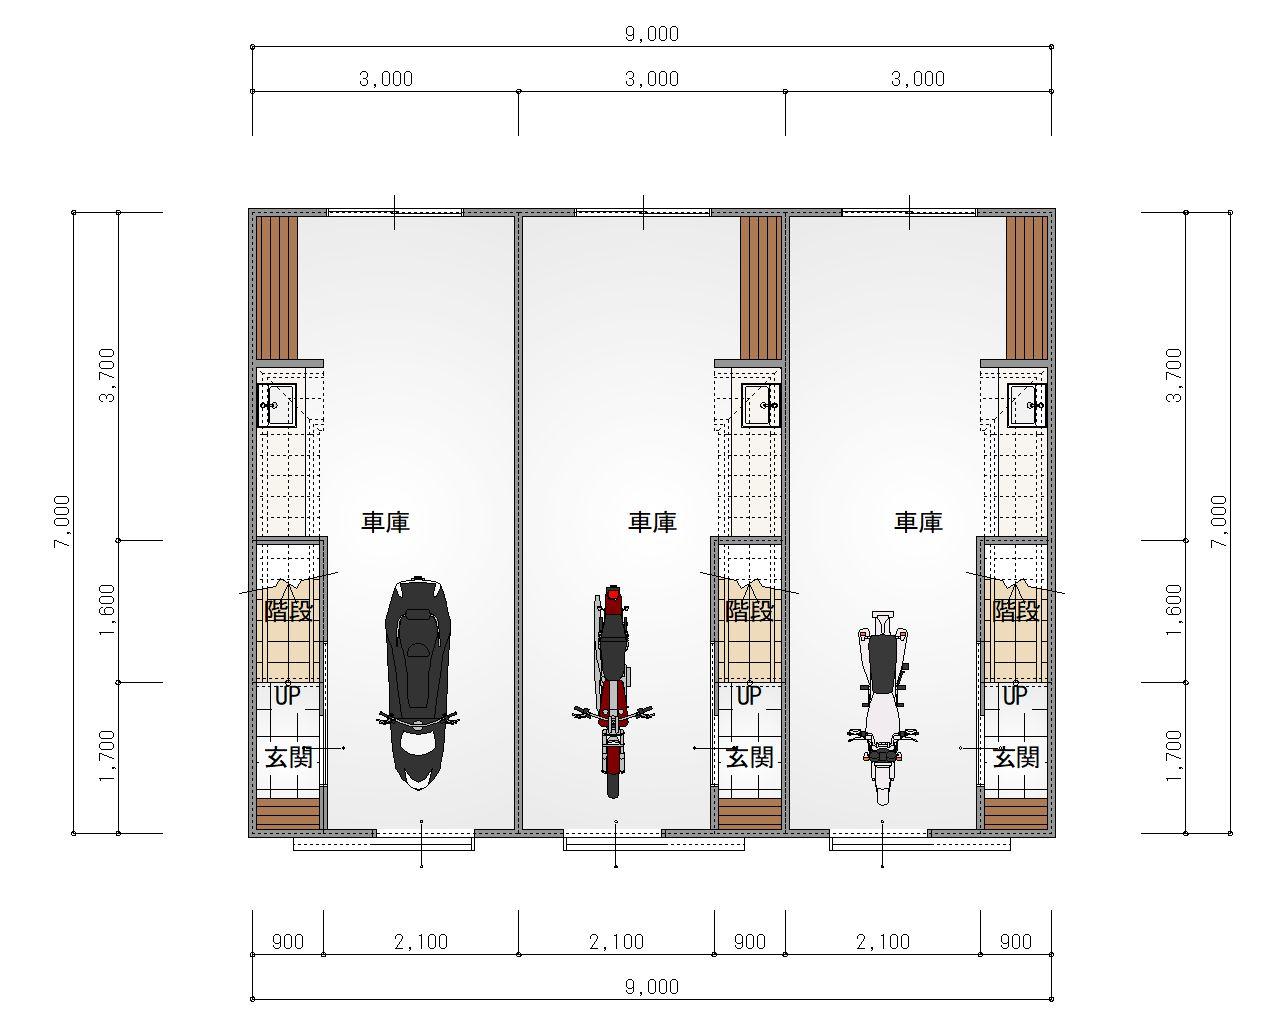 ESPRSSOガレージハウス千種 1階 平面図